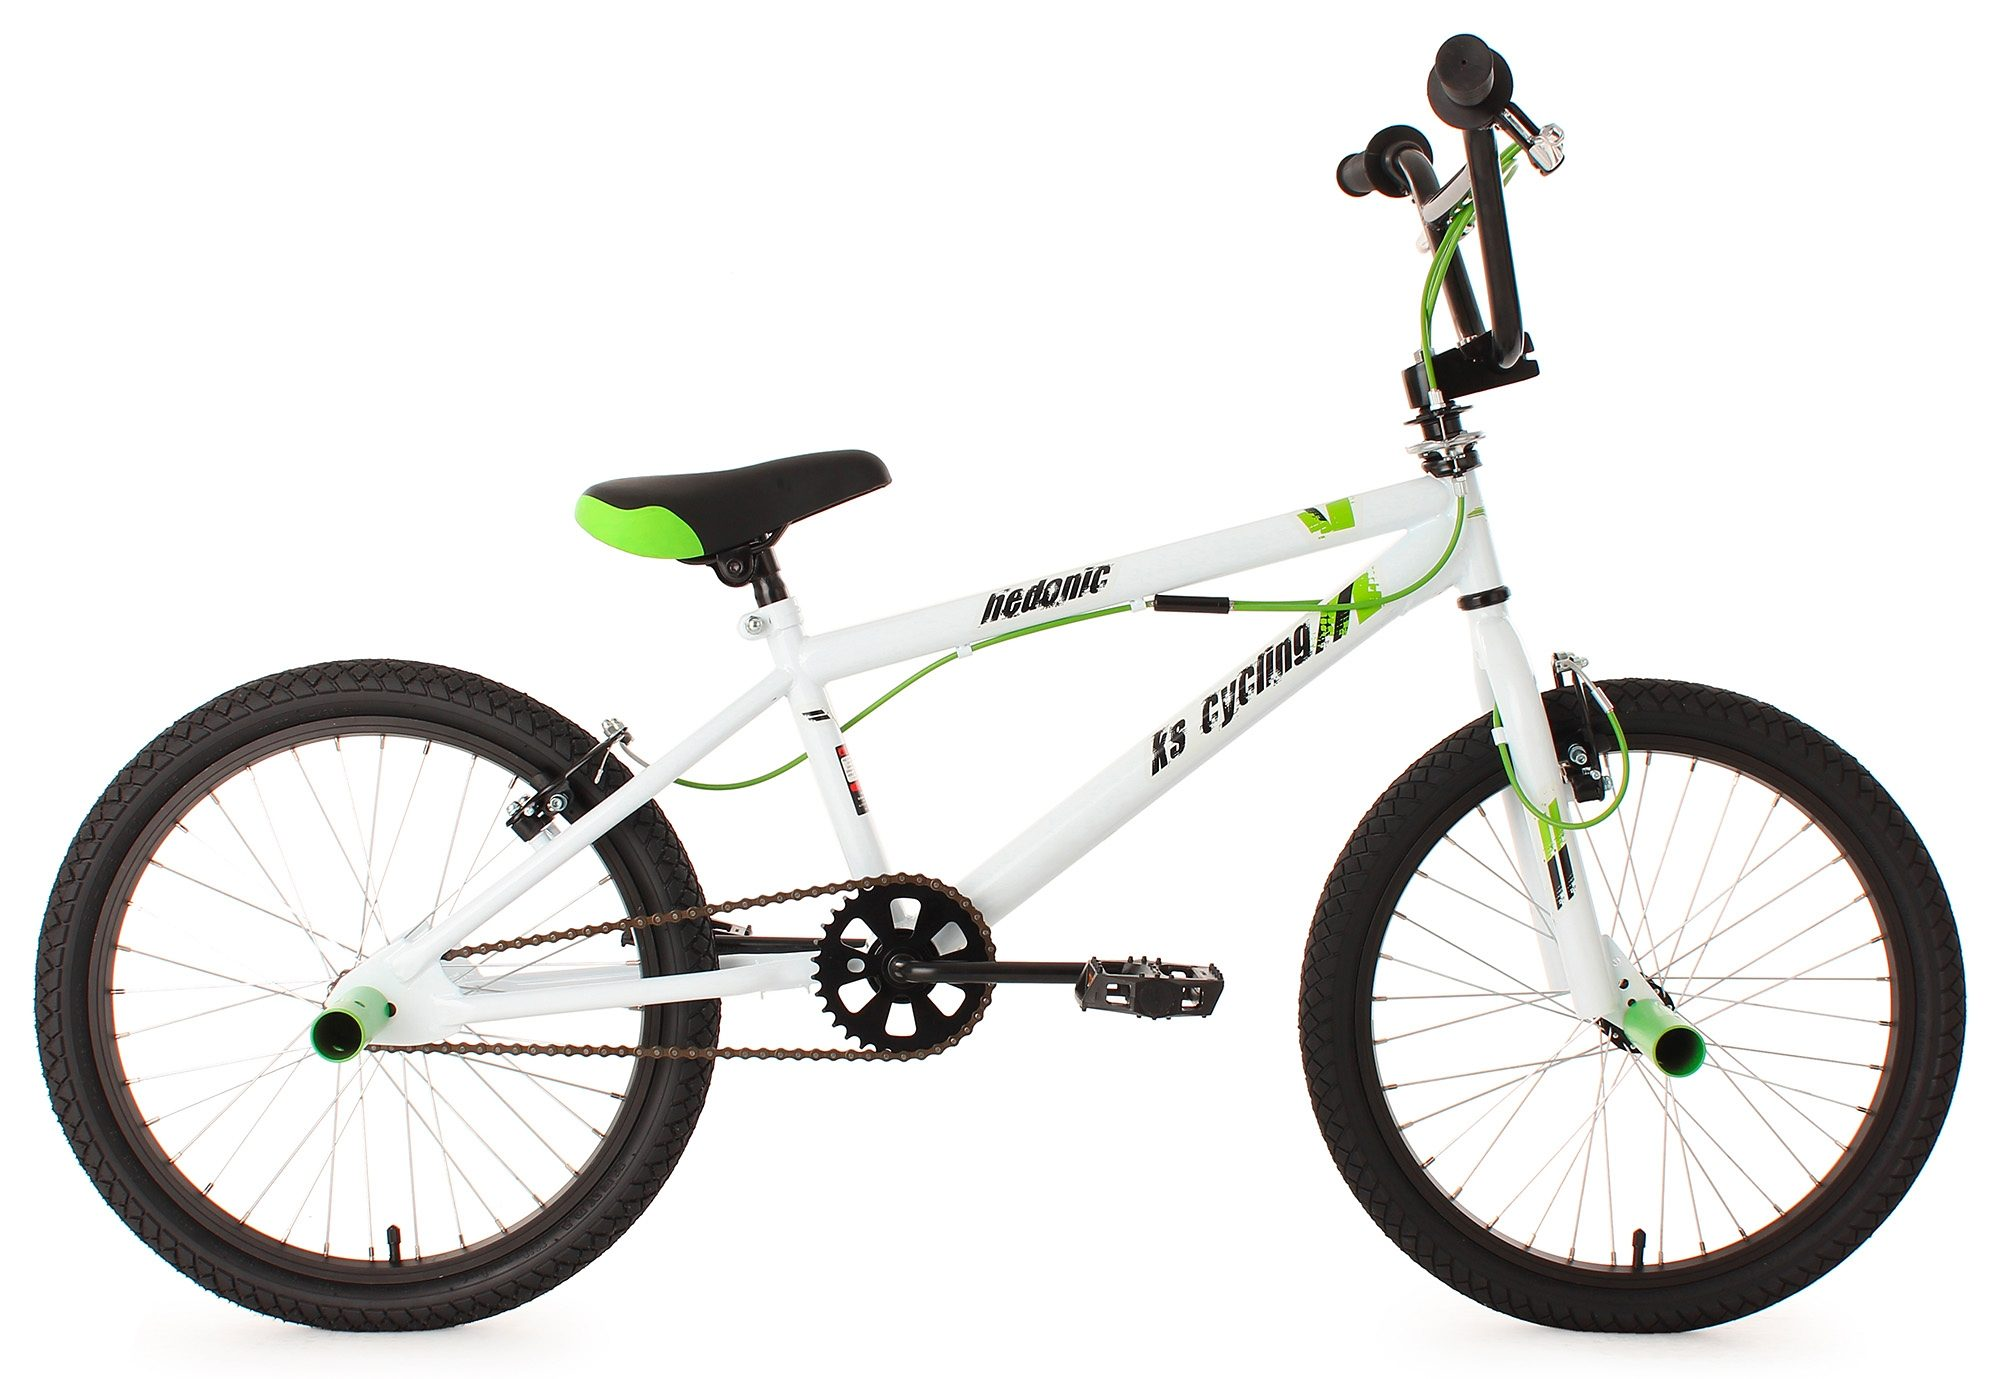 BMX Fahrrad, 20 Zoll, weiß, 360 Grad Rotor, »Hedonic«, KS Cycling